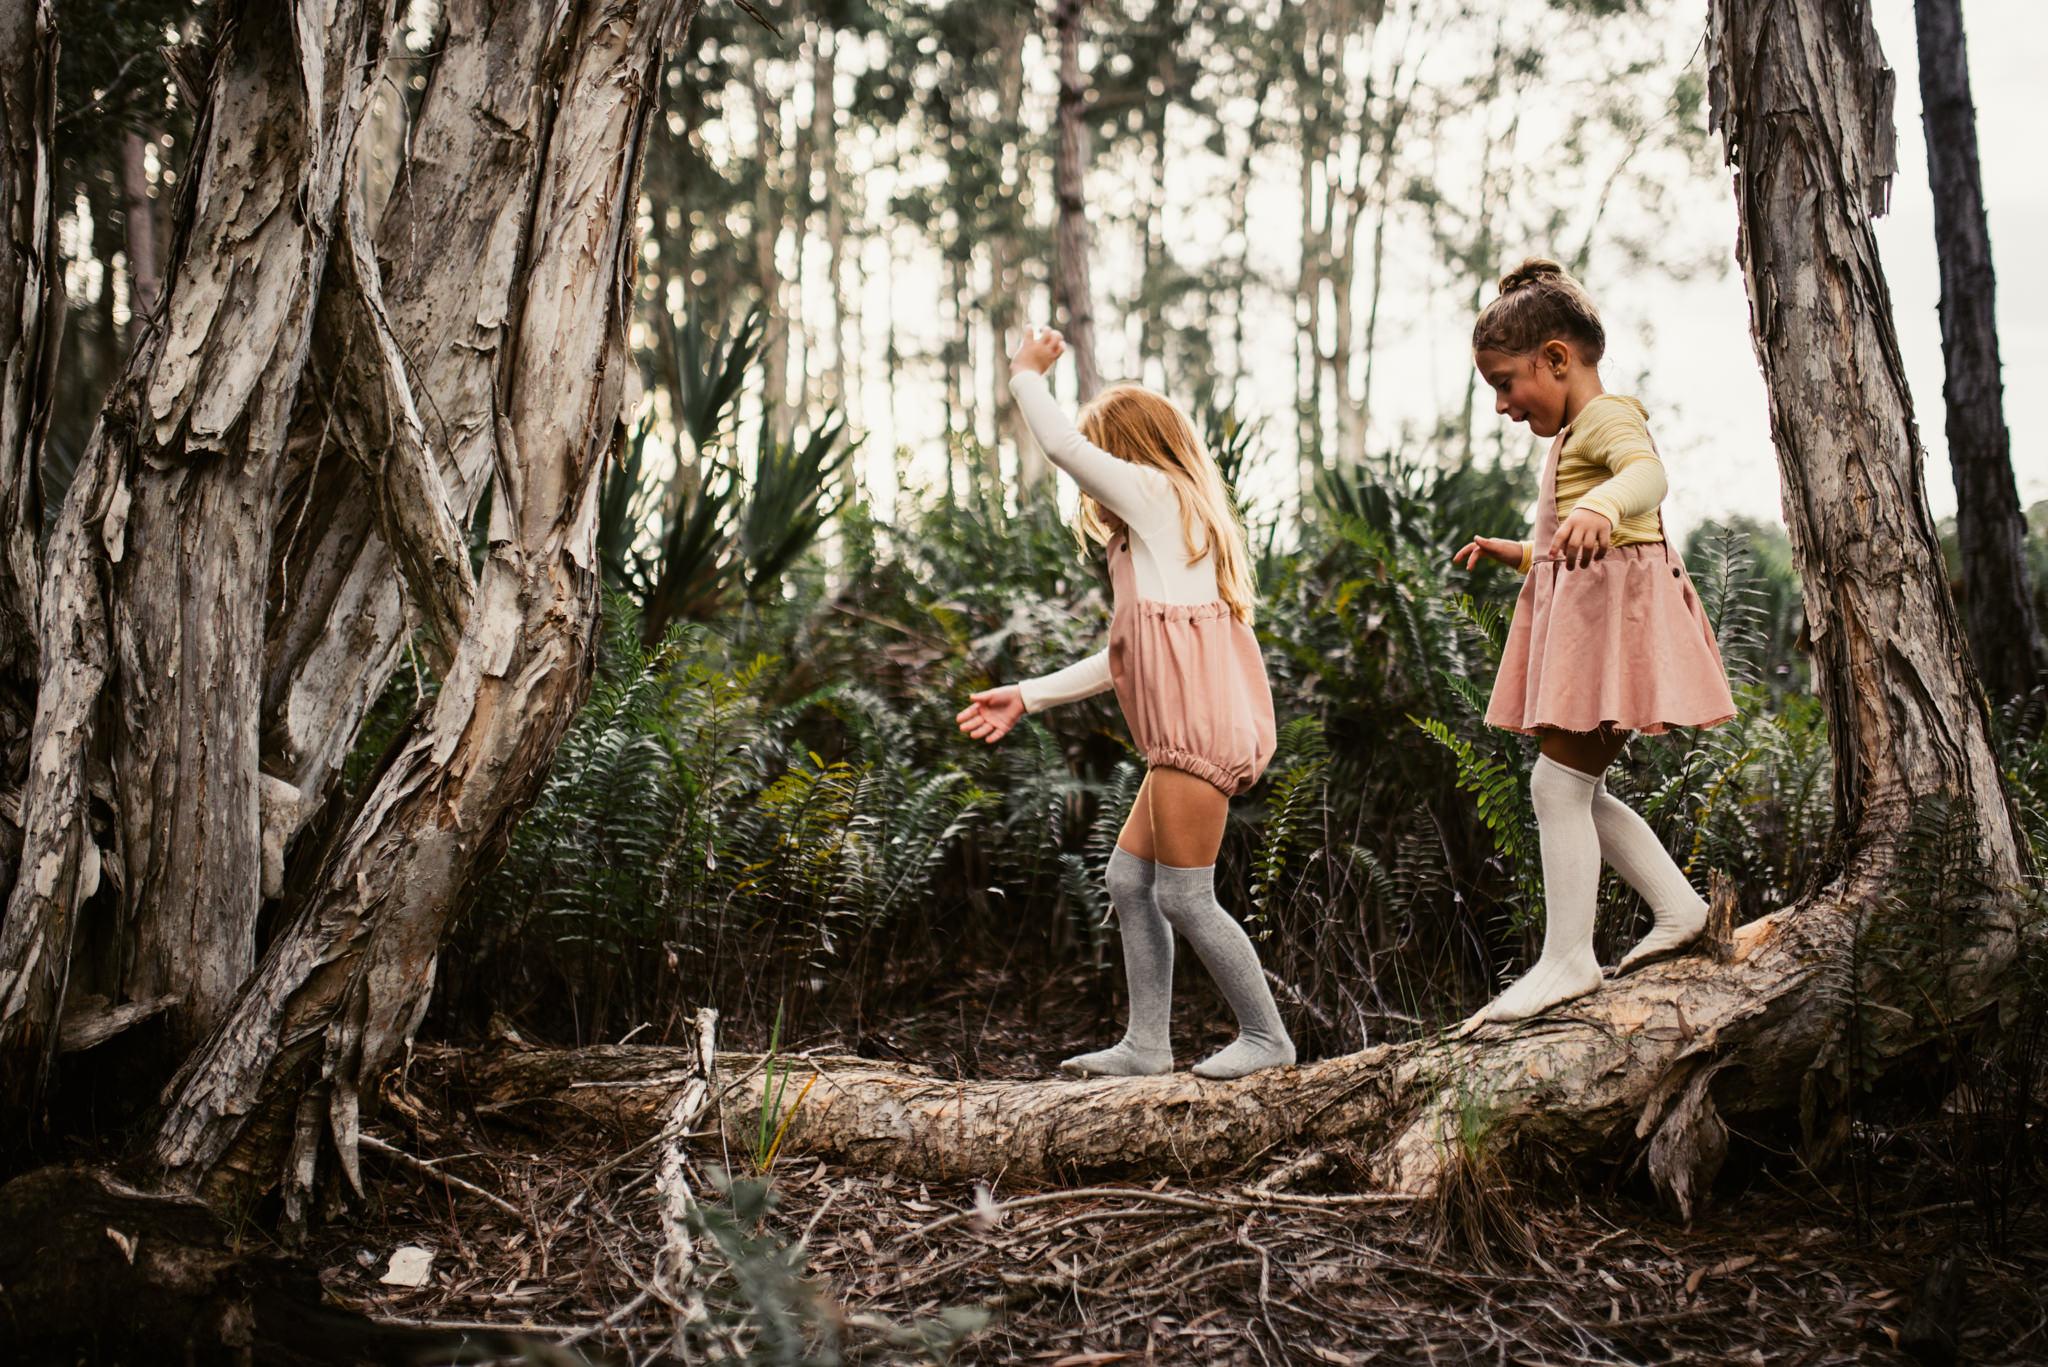 twyla jones photography - treasure coast florida - childrens adventure clothing commercial shoot--27.jpg